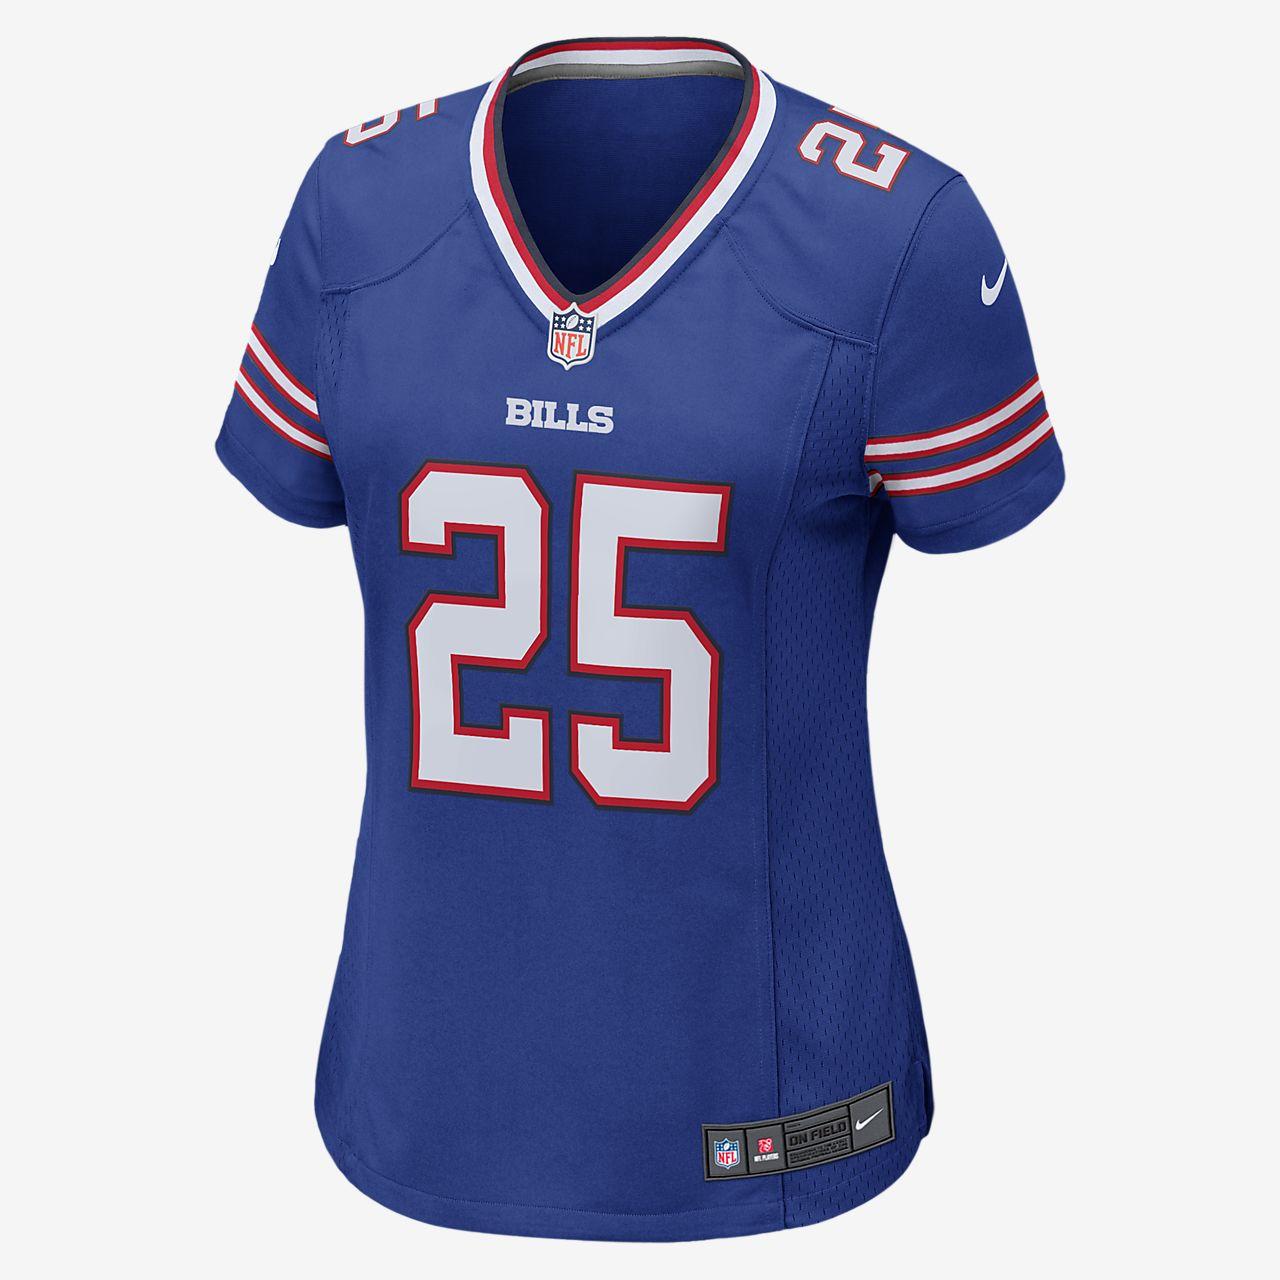 87c94ed8880 ... NFL Buffalo Bills (LeSean McCoy) Women's Football Home Game Jersey